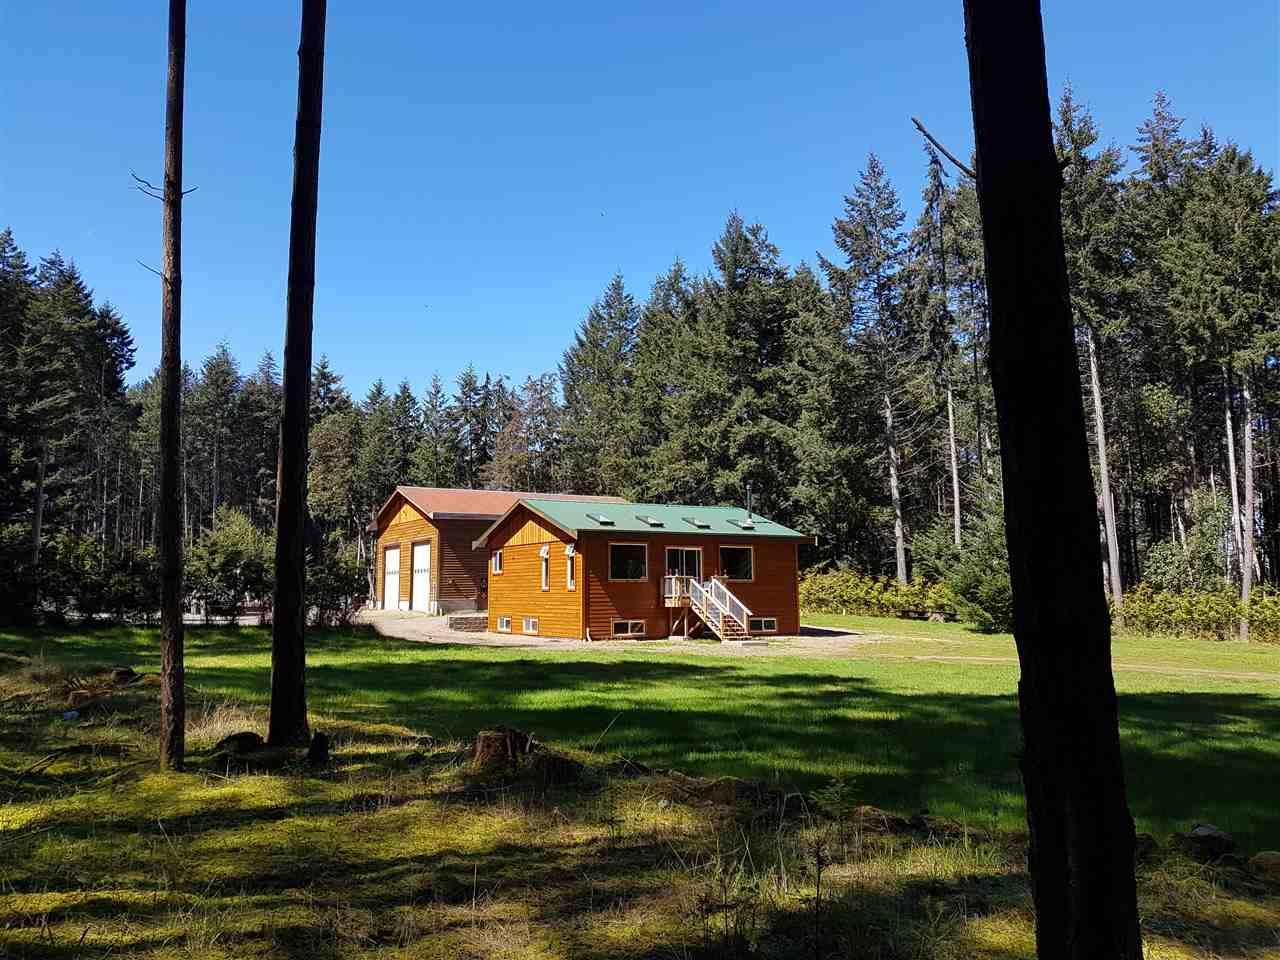 Galiano Island Real Estate For Sale